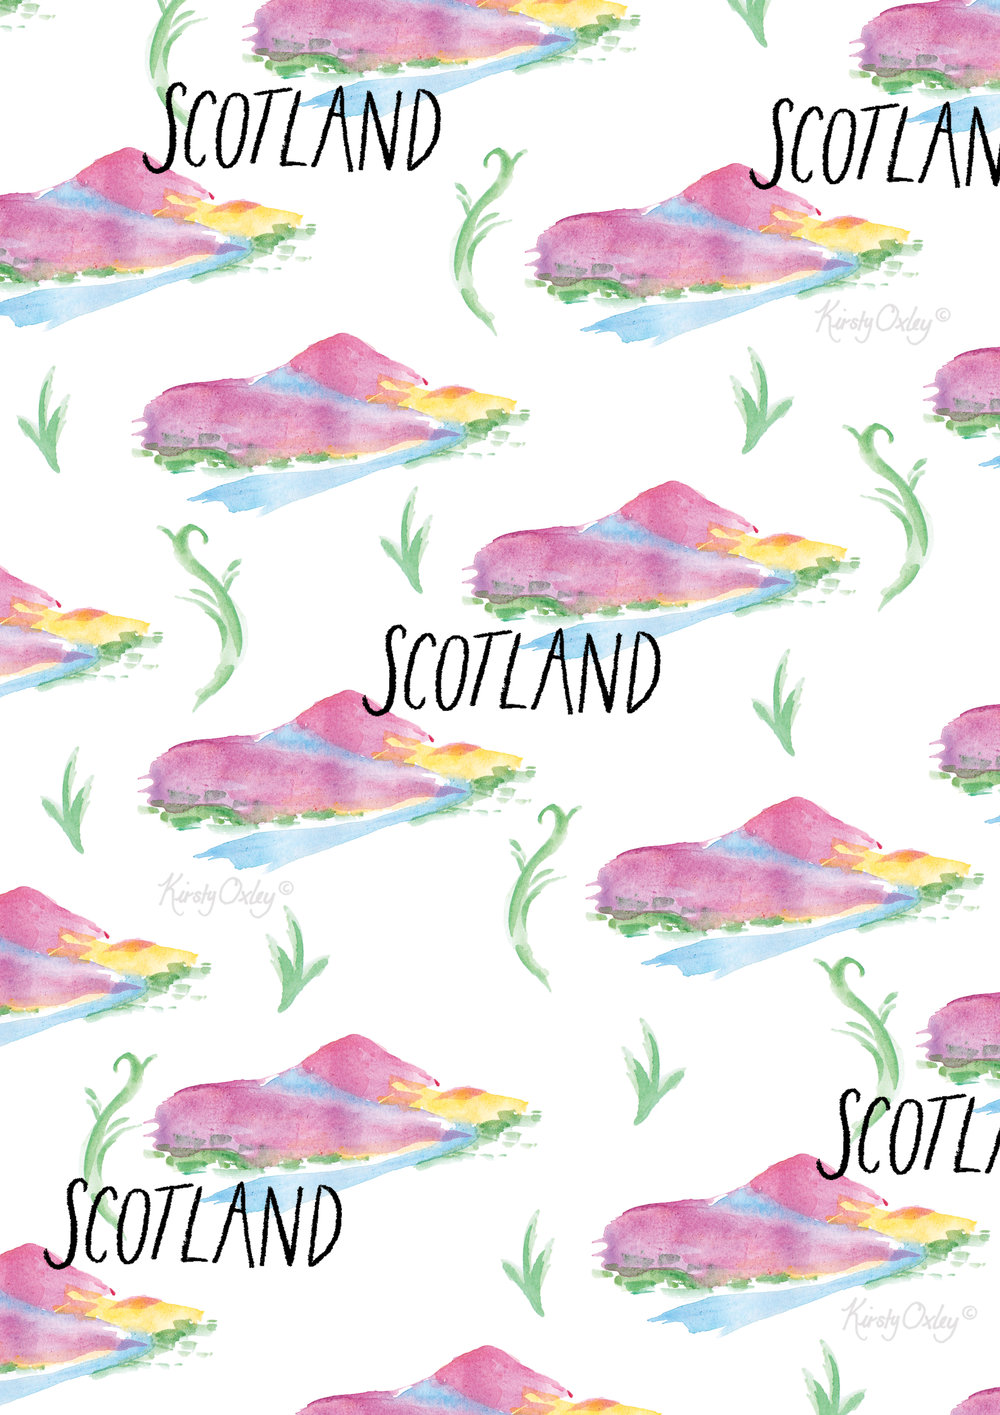 scotland_pattern_kirsty_oxley_illustration.jpg